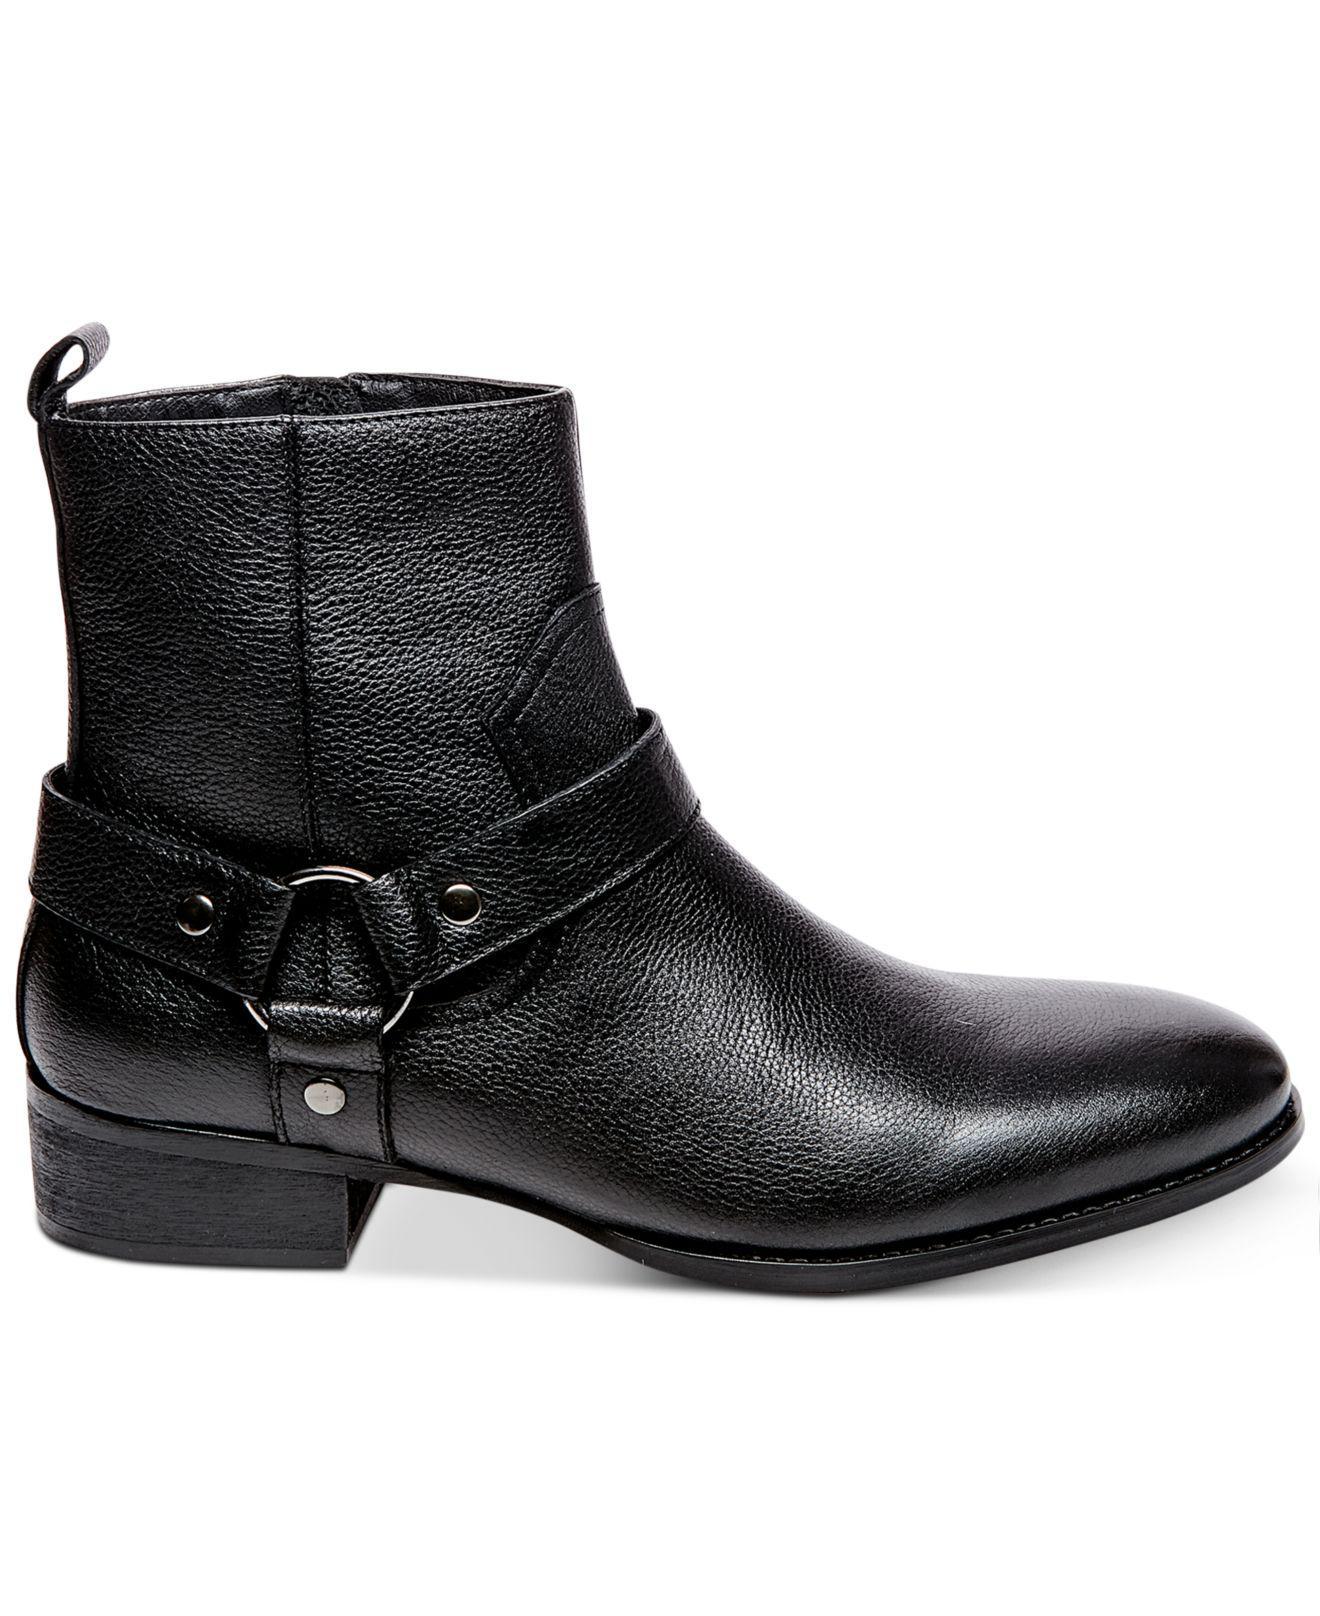 d7a604cf91b Lyst - Steve Madden Men s Palazzo Side-zip Boots in Black for Men